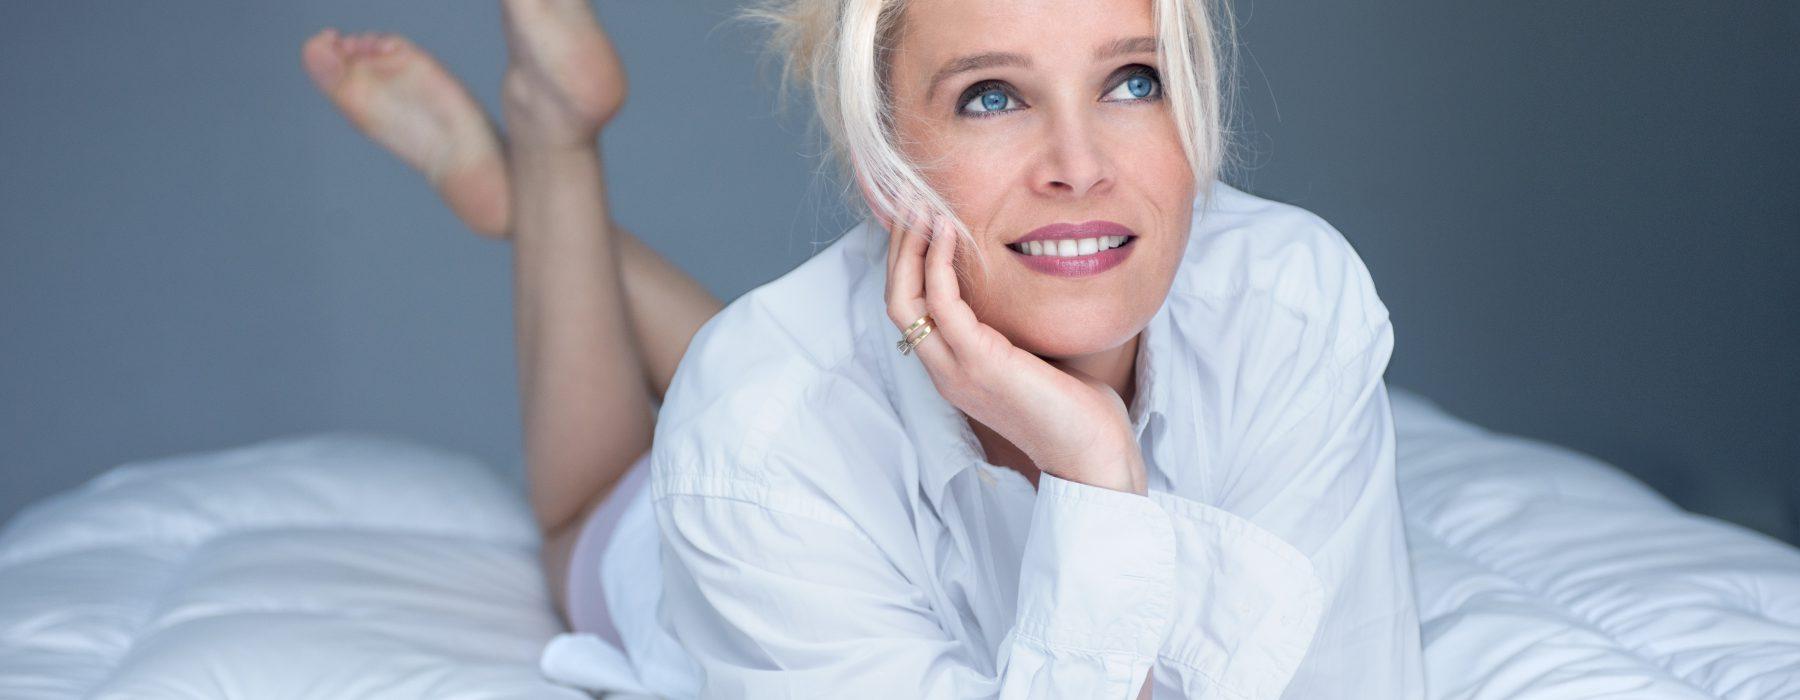 Menopause: symptoms of the menopause